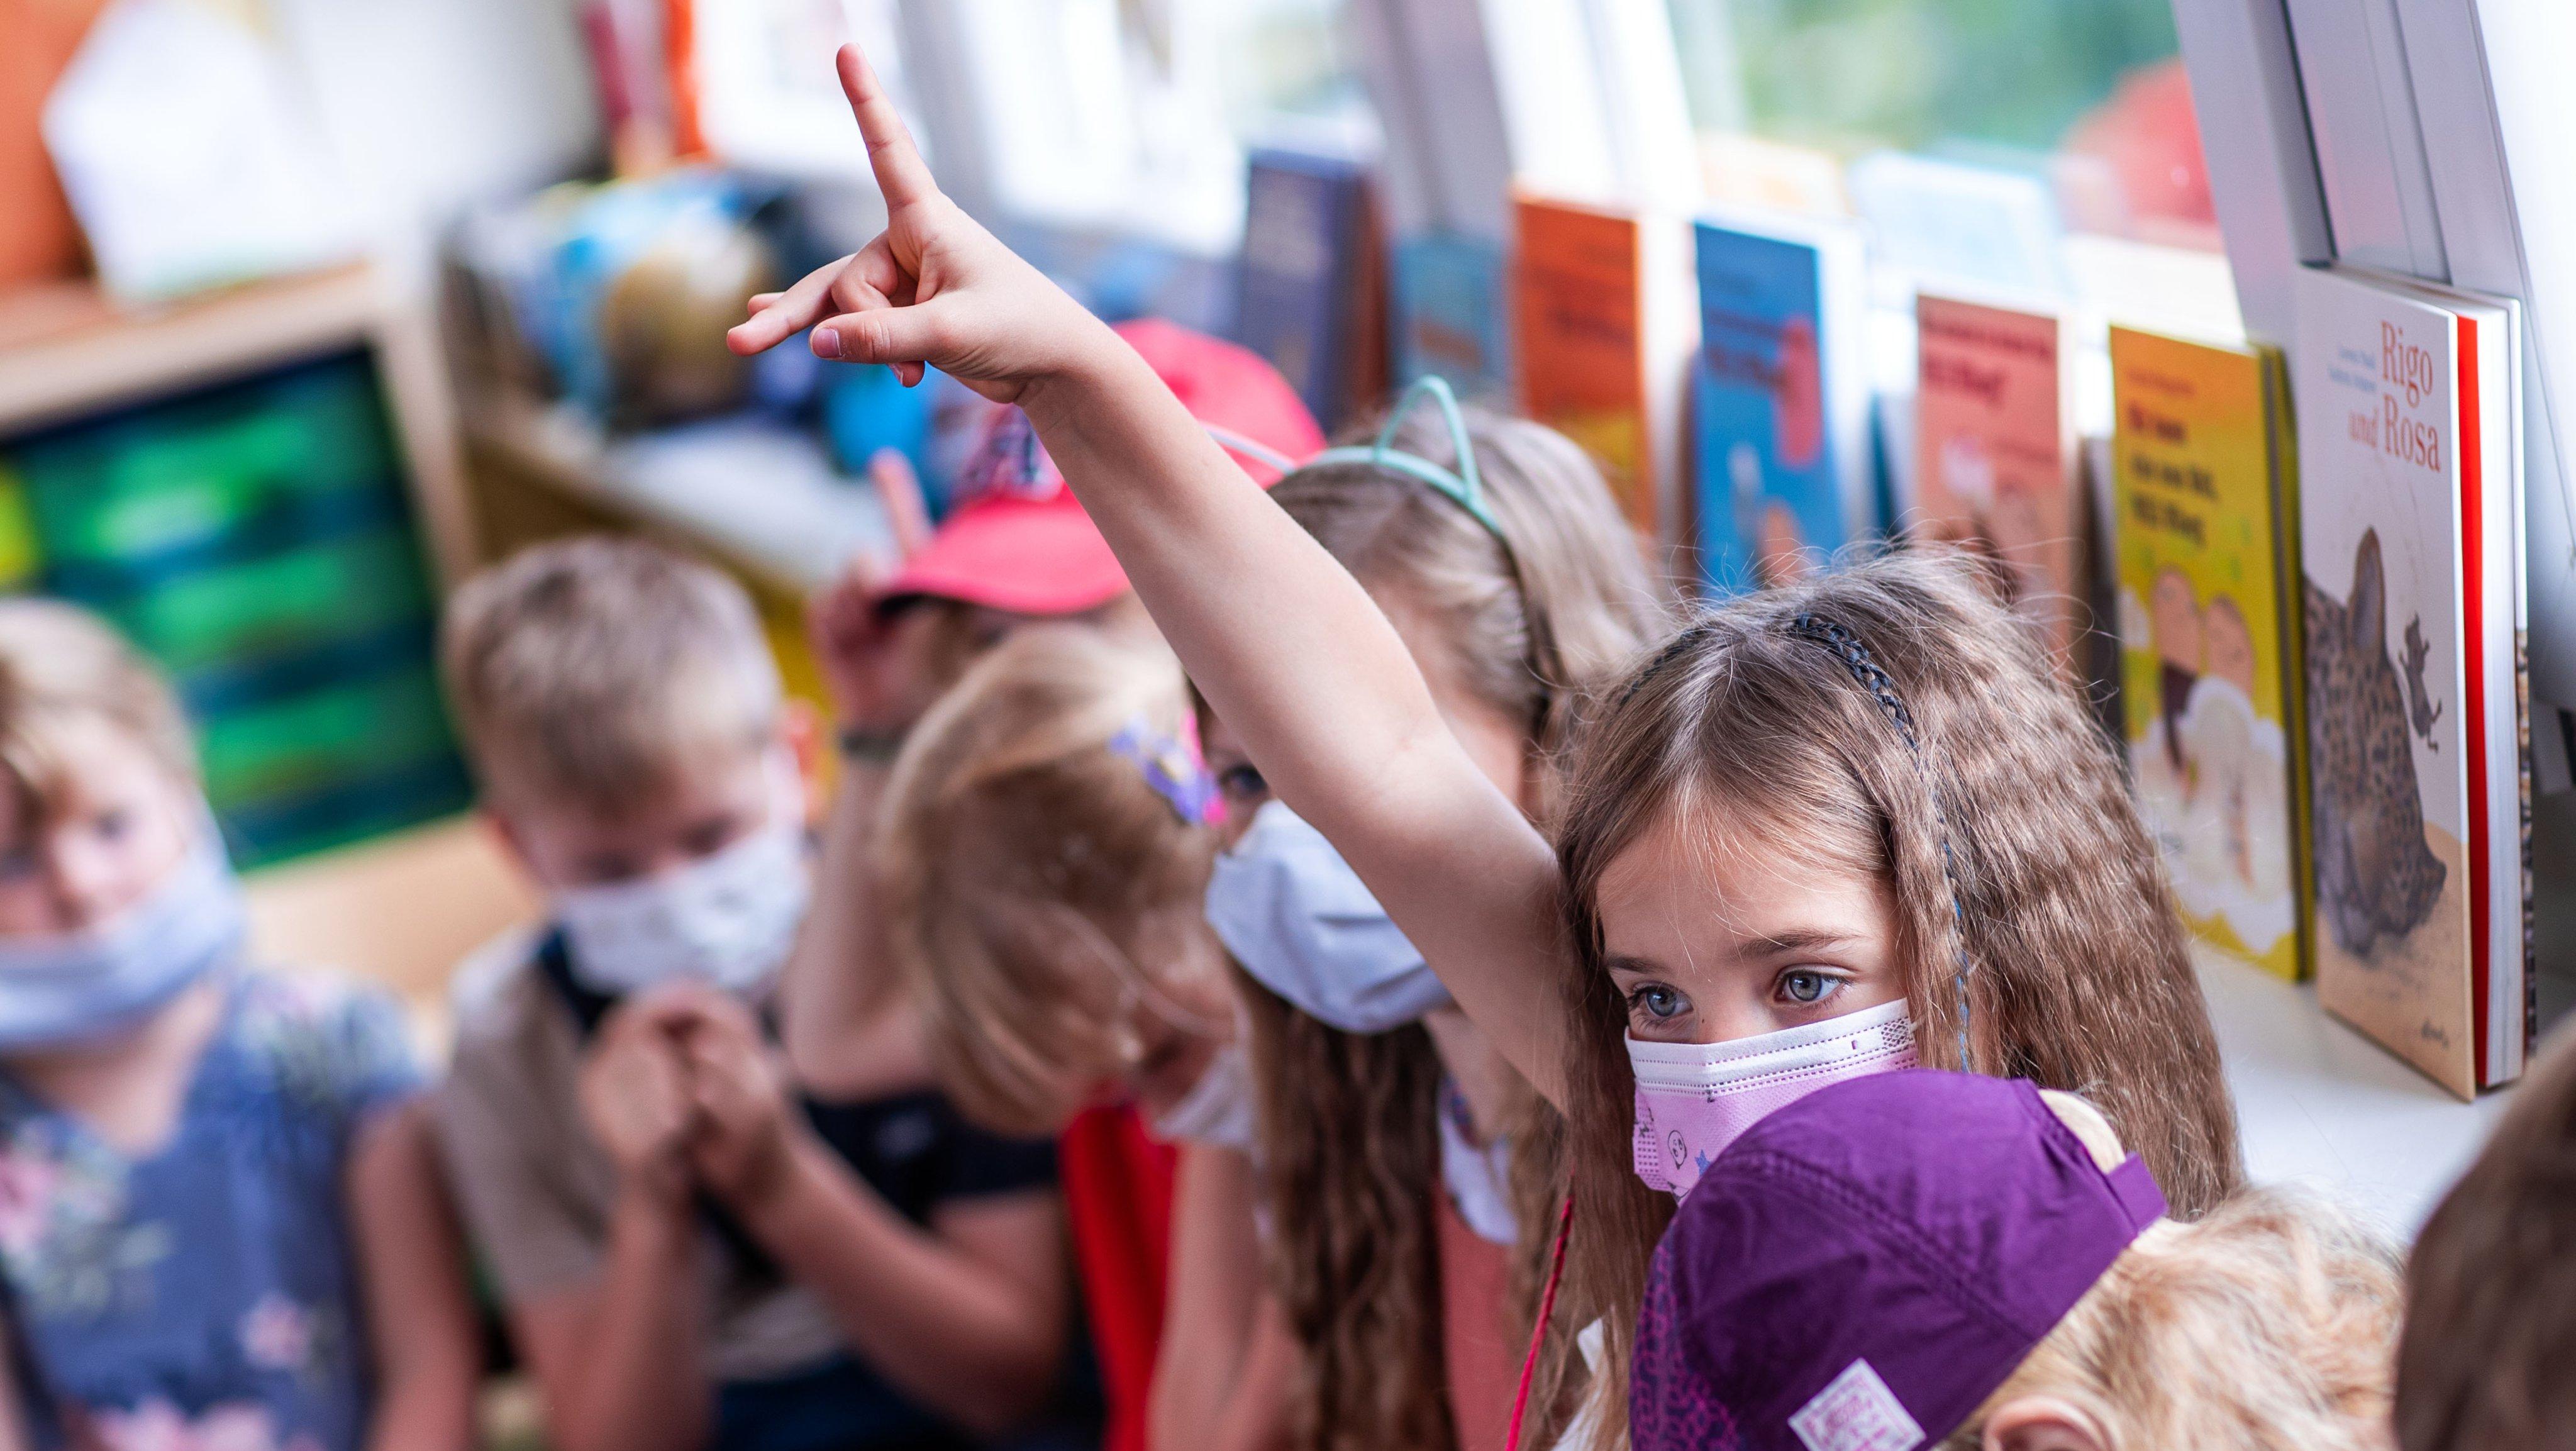 Coronavirus - First school day after summer holidays in Rostock